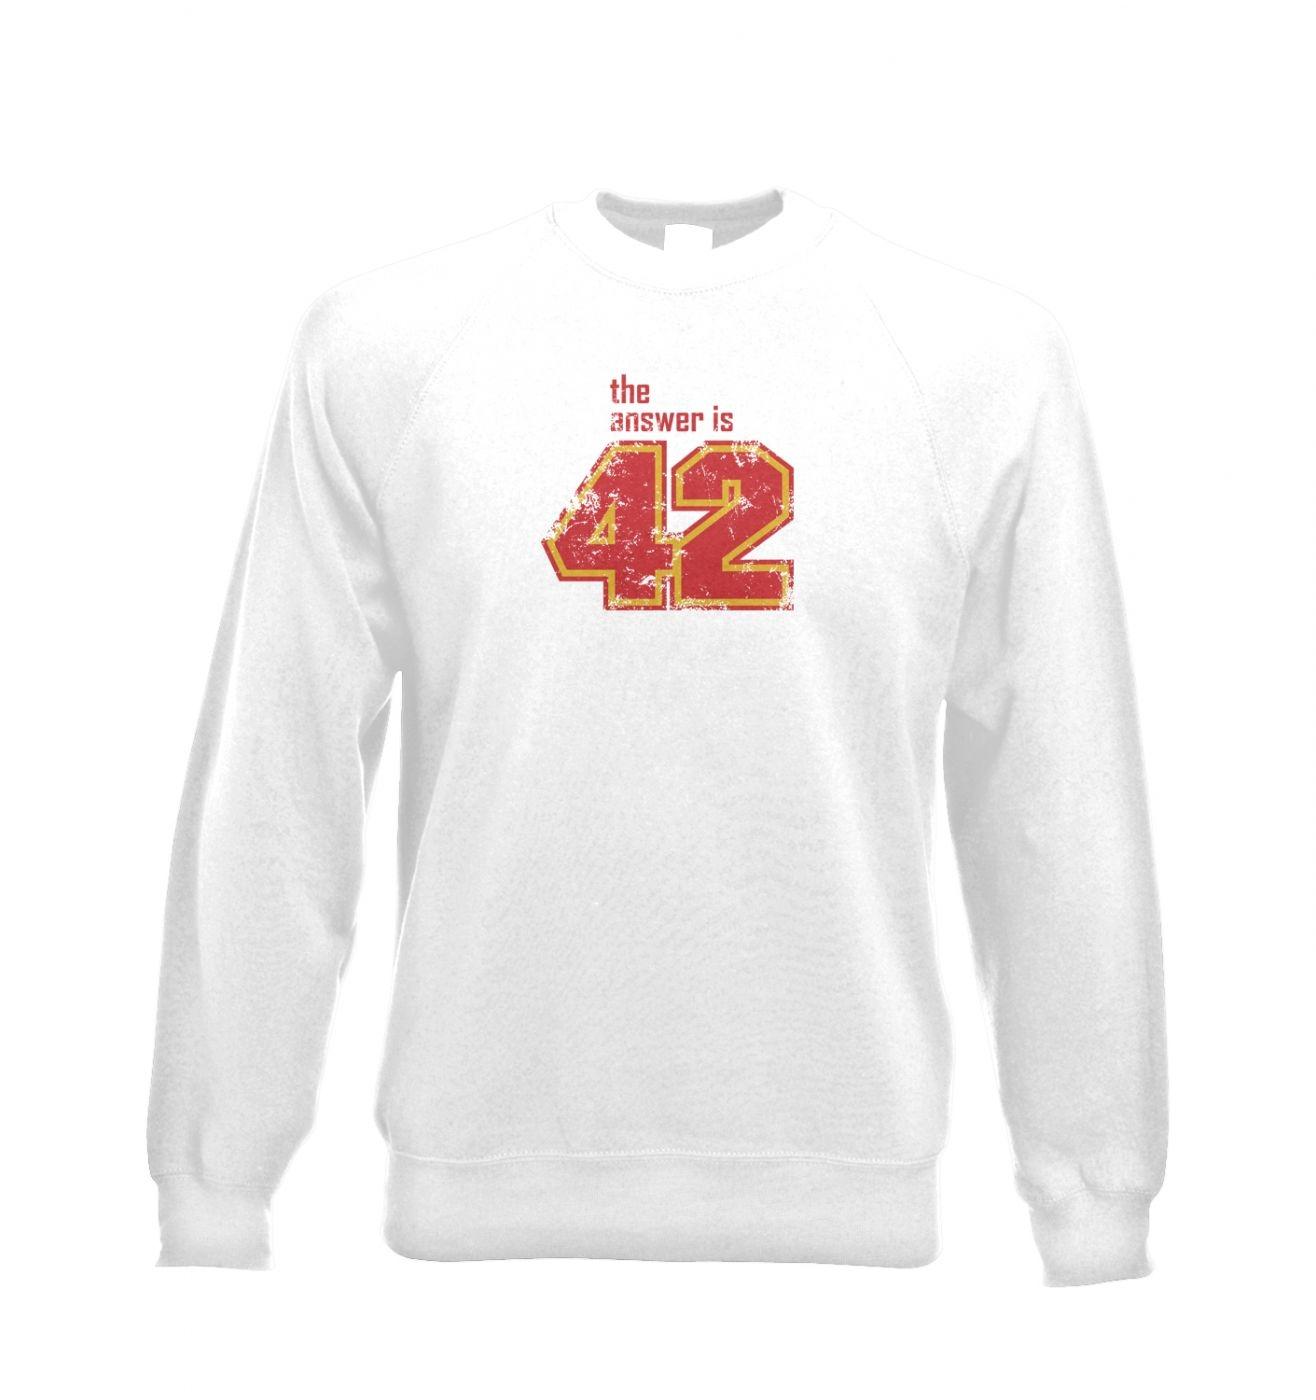 The Answer Is 42 crewneck sweatshirt